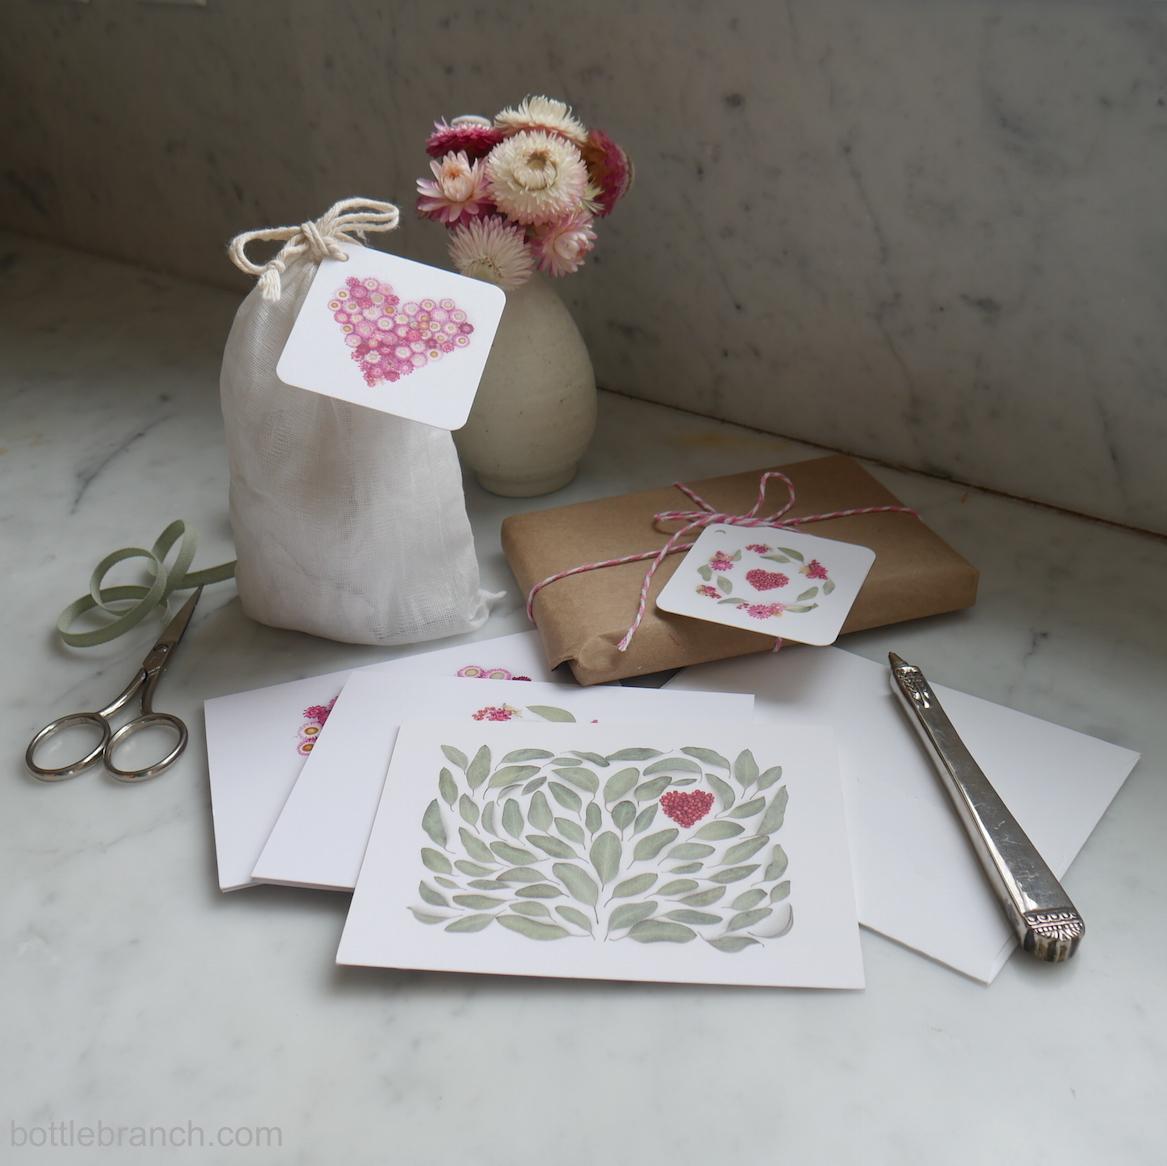 heart-paper-product-bottle-branch